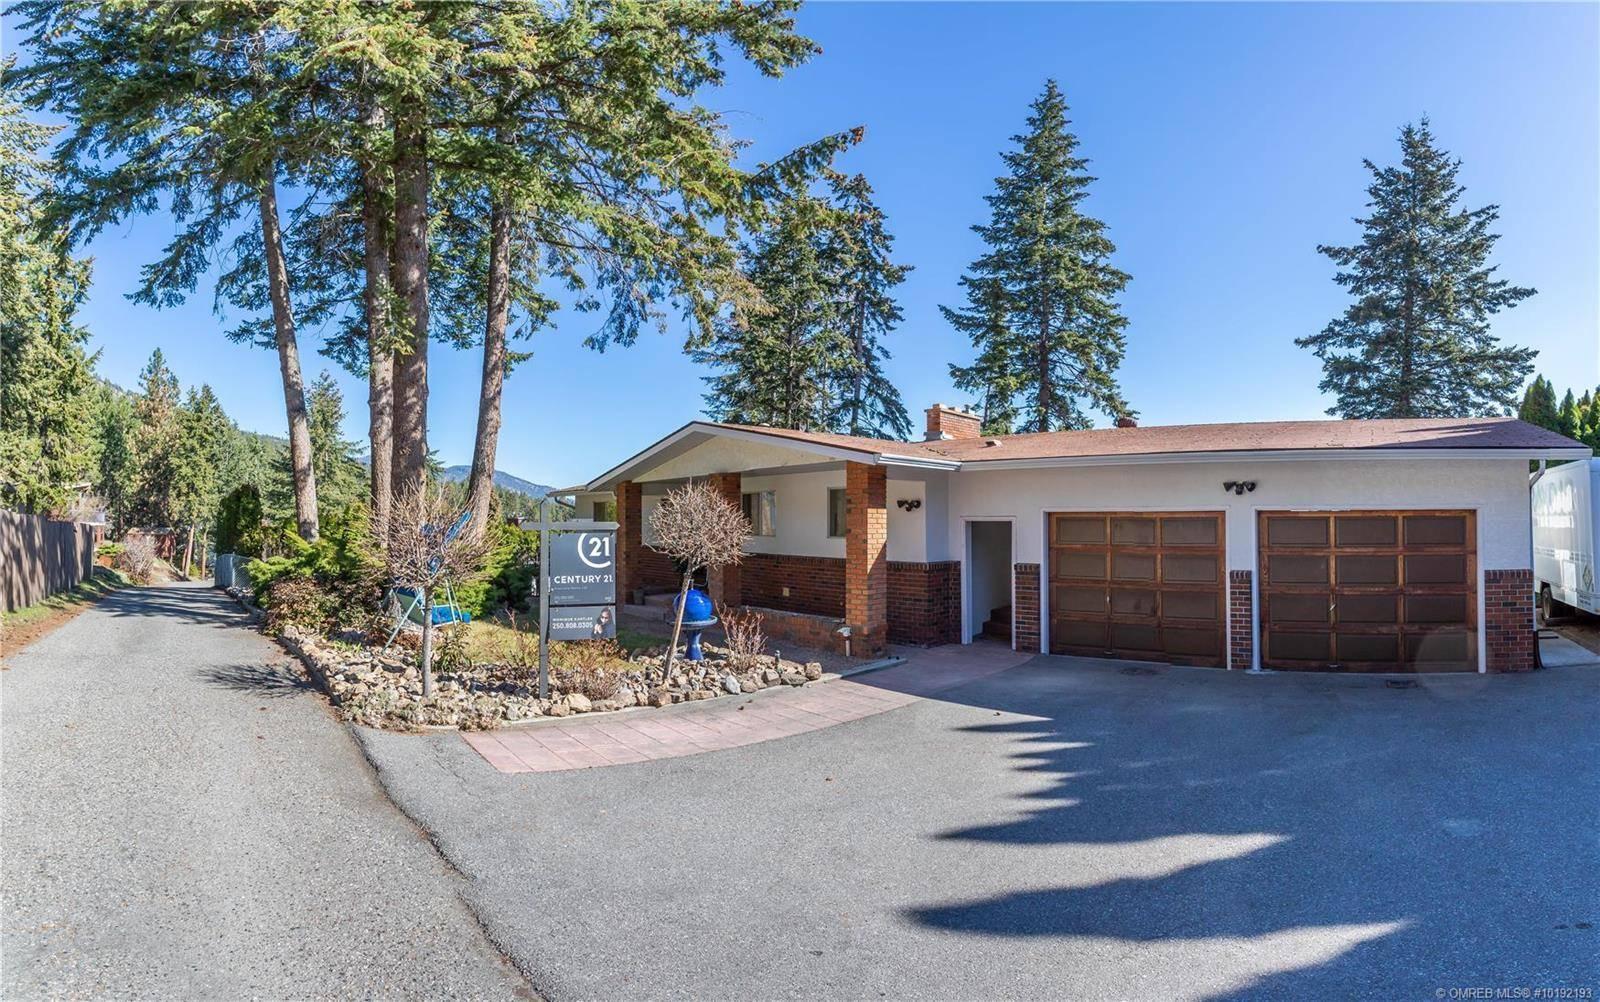 House for sale at 1554 Mcnaughton Rd West Kelowna British Columbia - MLS: 10192193